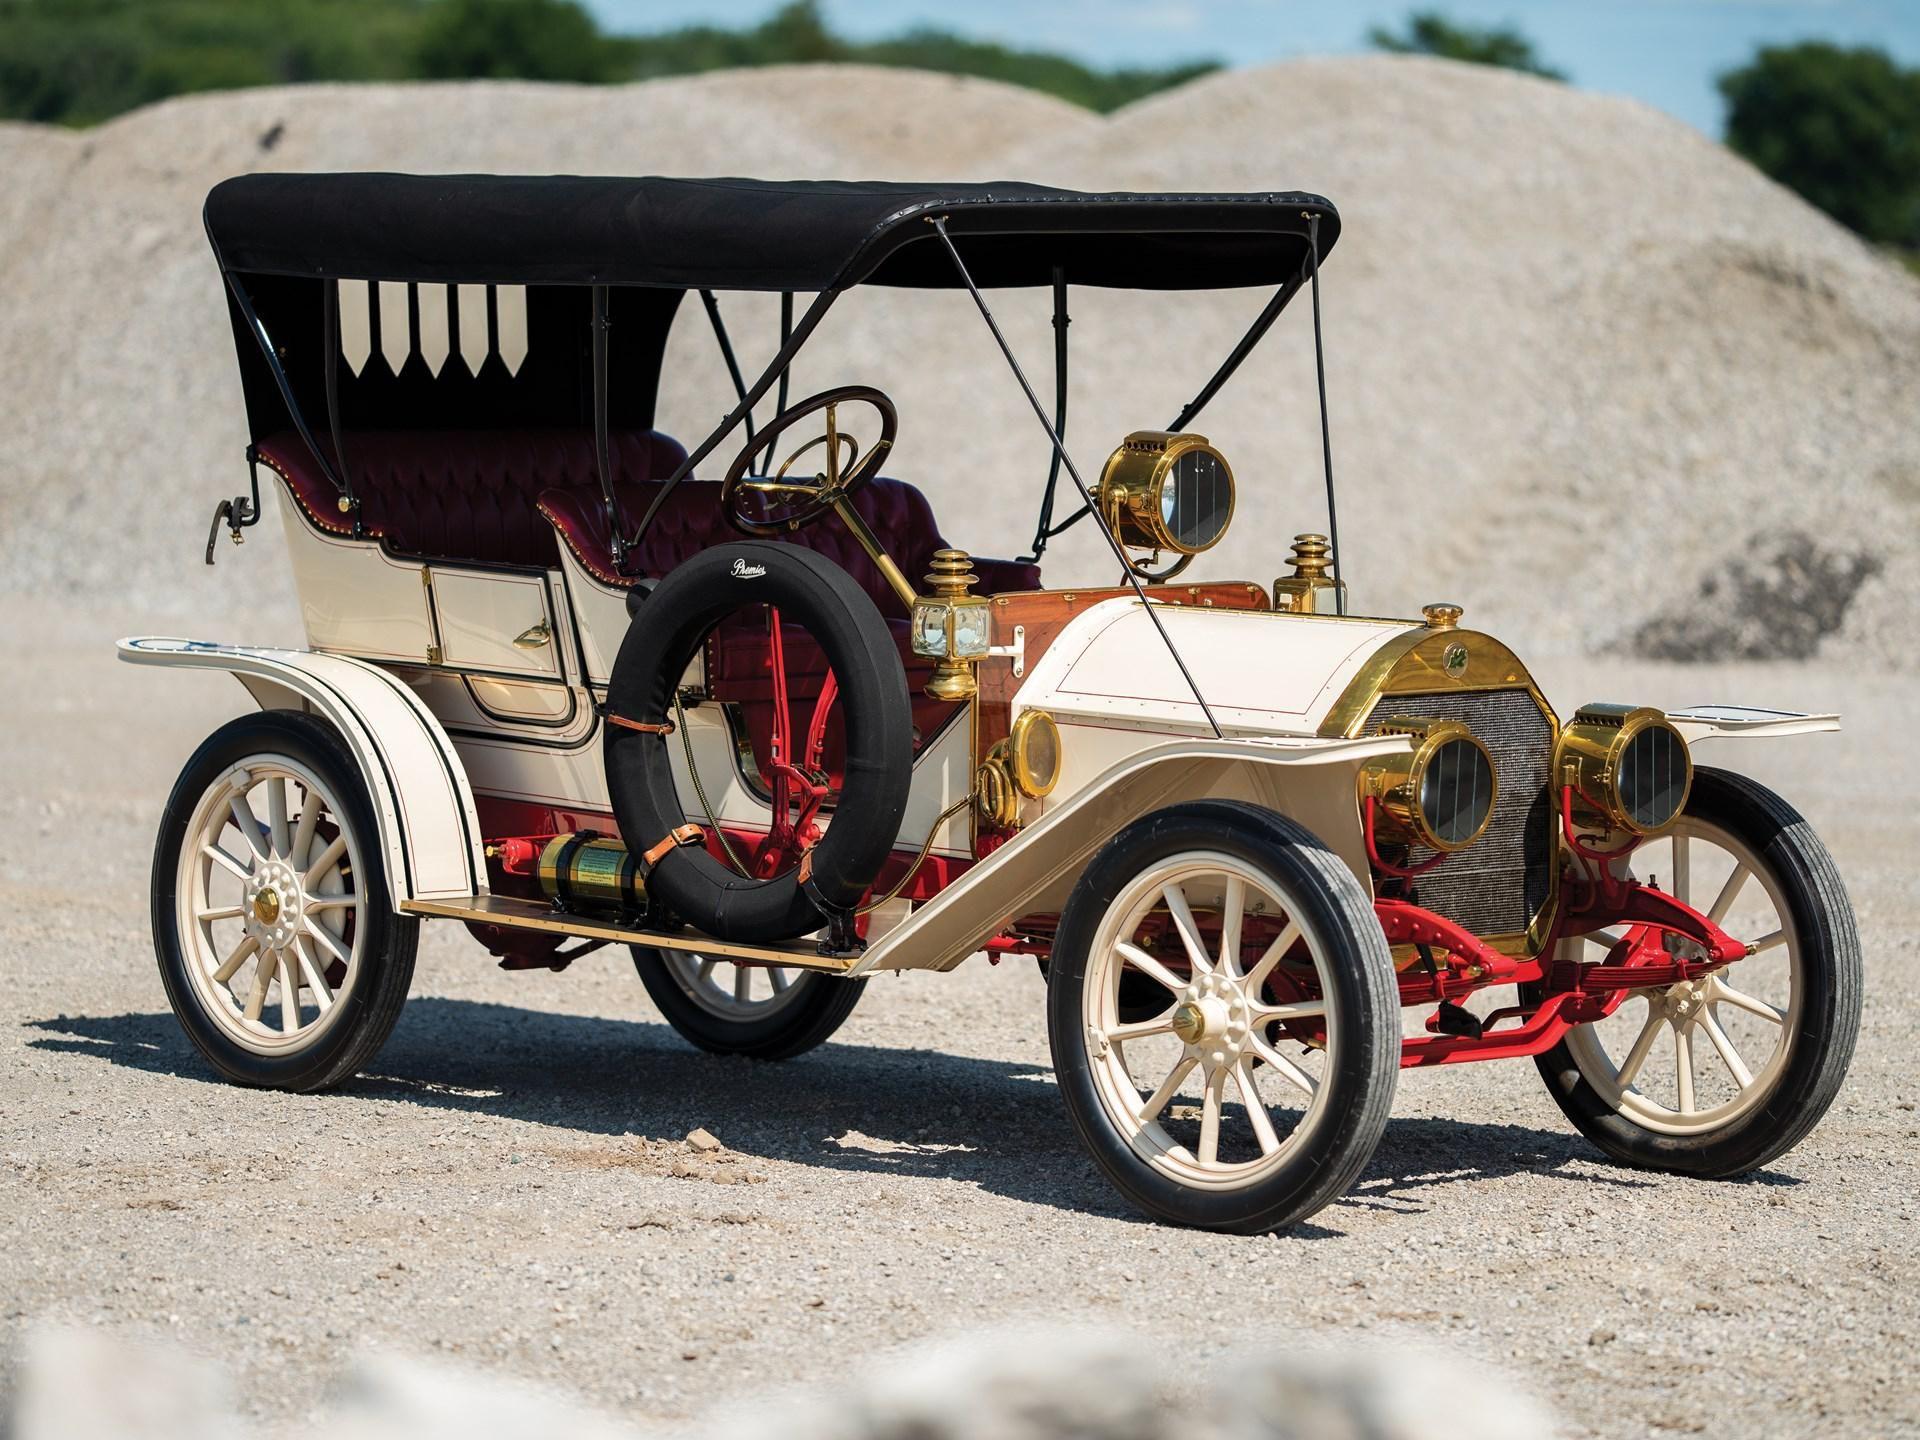 1910 Premier Model 4-40 Clubman